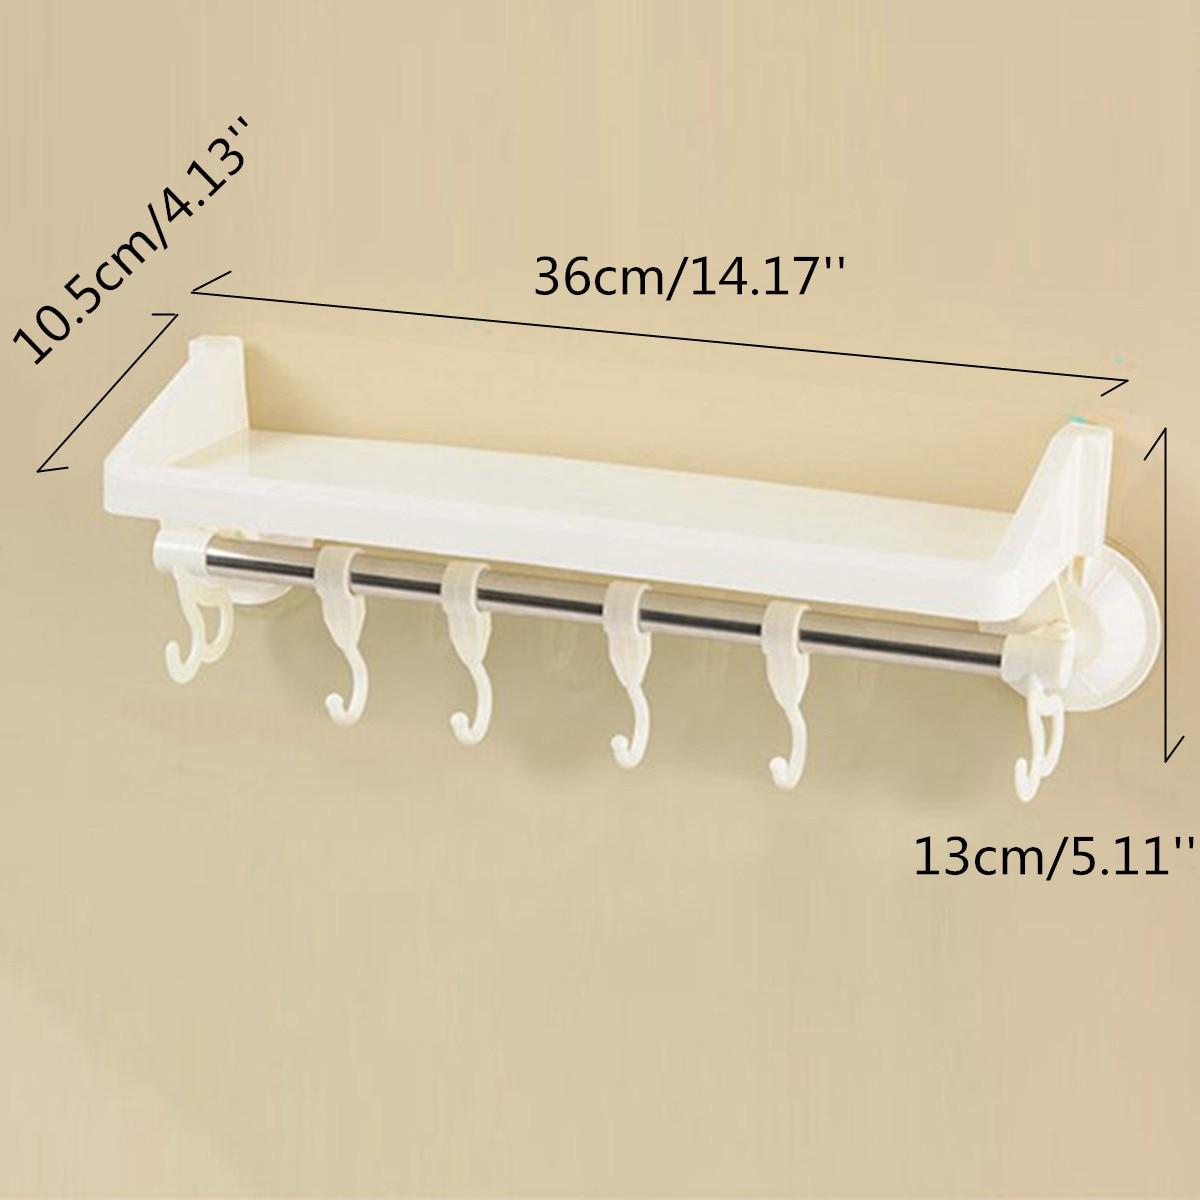 Marvelous Plastic Rack Storage Bathroom Shower Shelf Makeup Towel Sponge Holder  Suction Organizer Toilet Wall Kitchen Corner In Storage Holders U0026 Racks  From Home ...